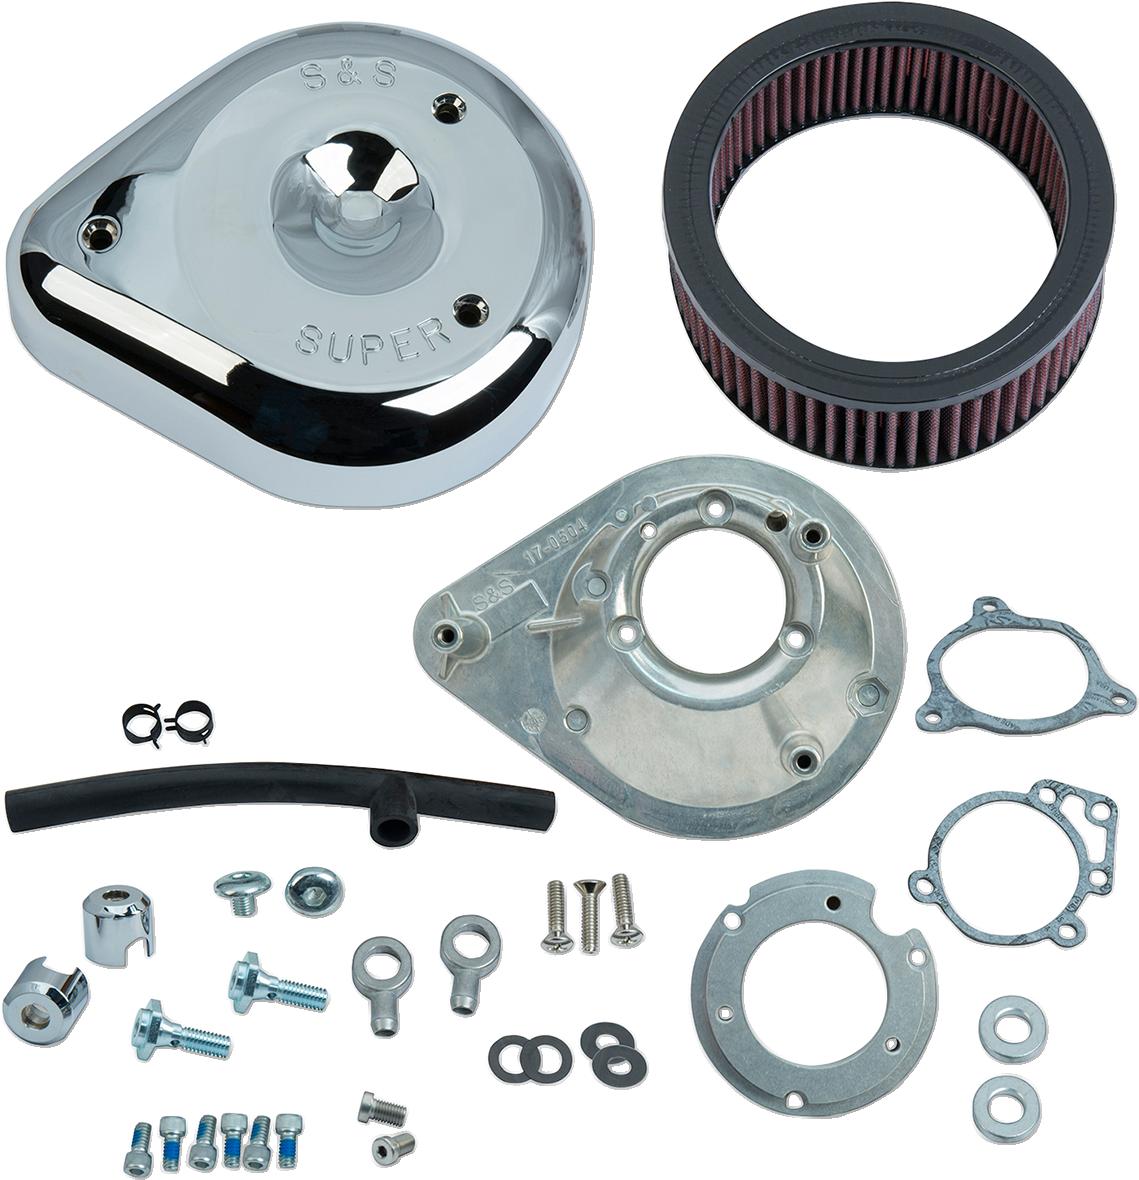 S&S Chrome Teardrop Air Cleaner Filter Kit 08-17 Harley Touring Softail FXSB FLS